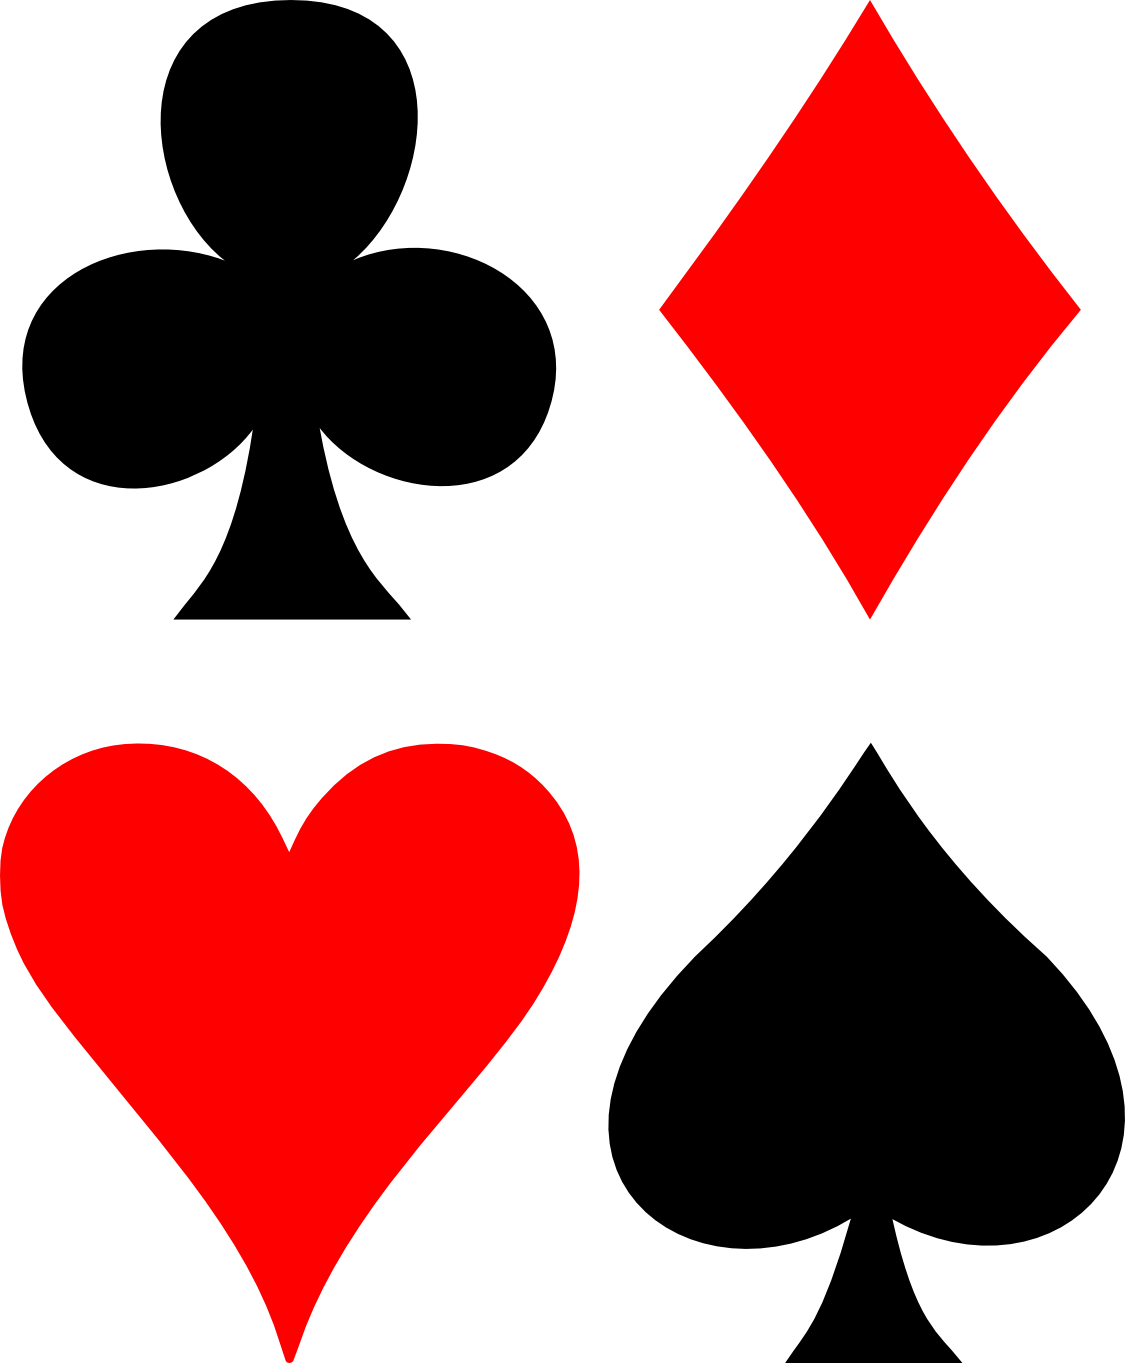 free play online casino king of hearts spielen